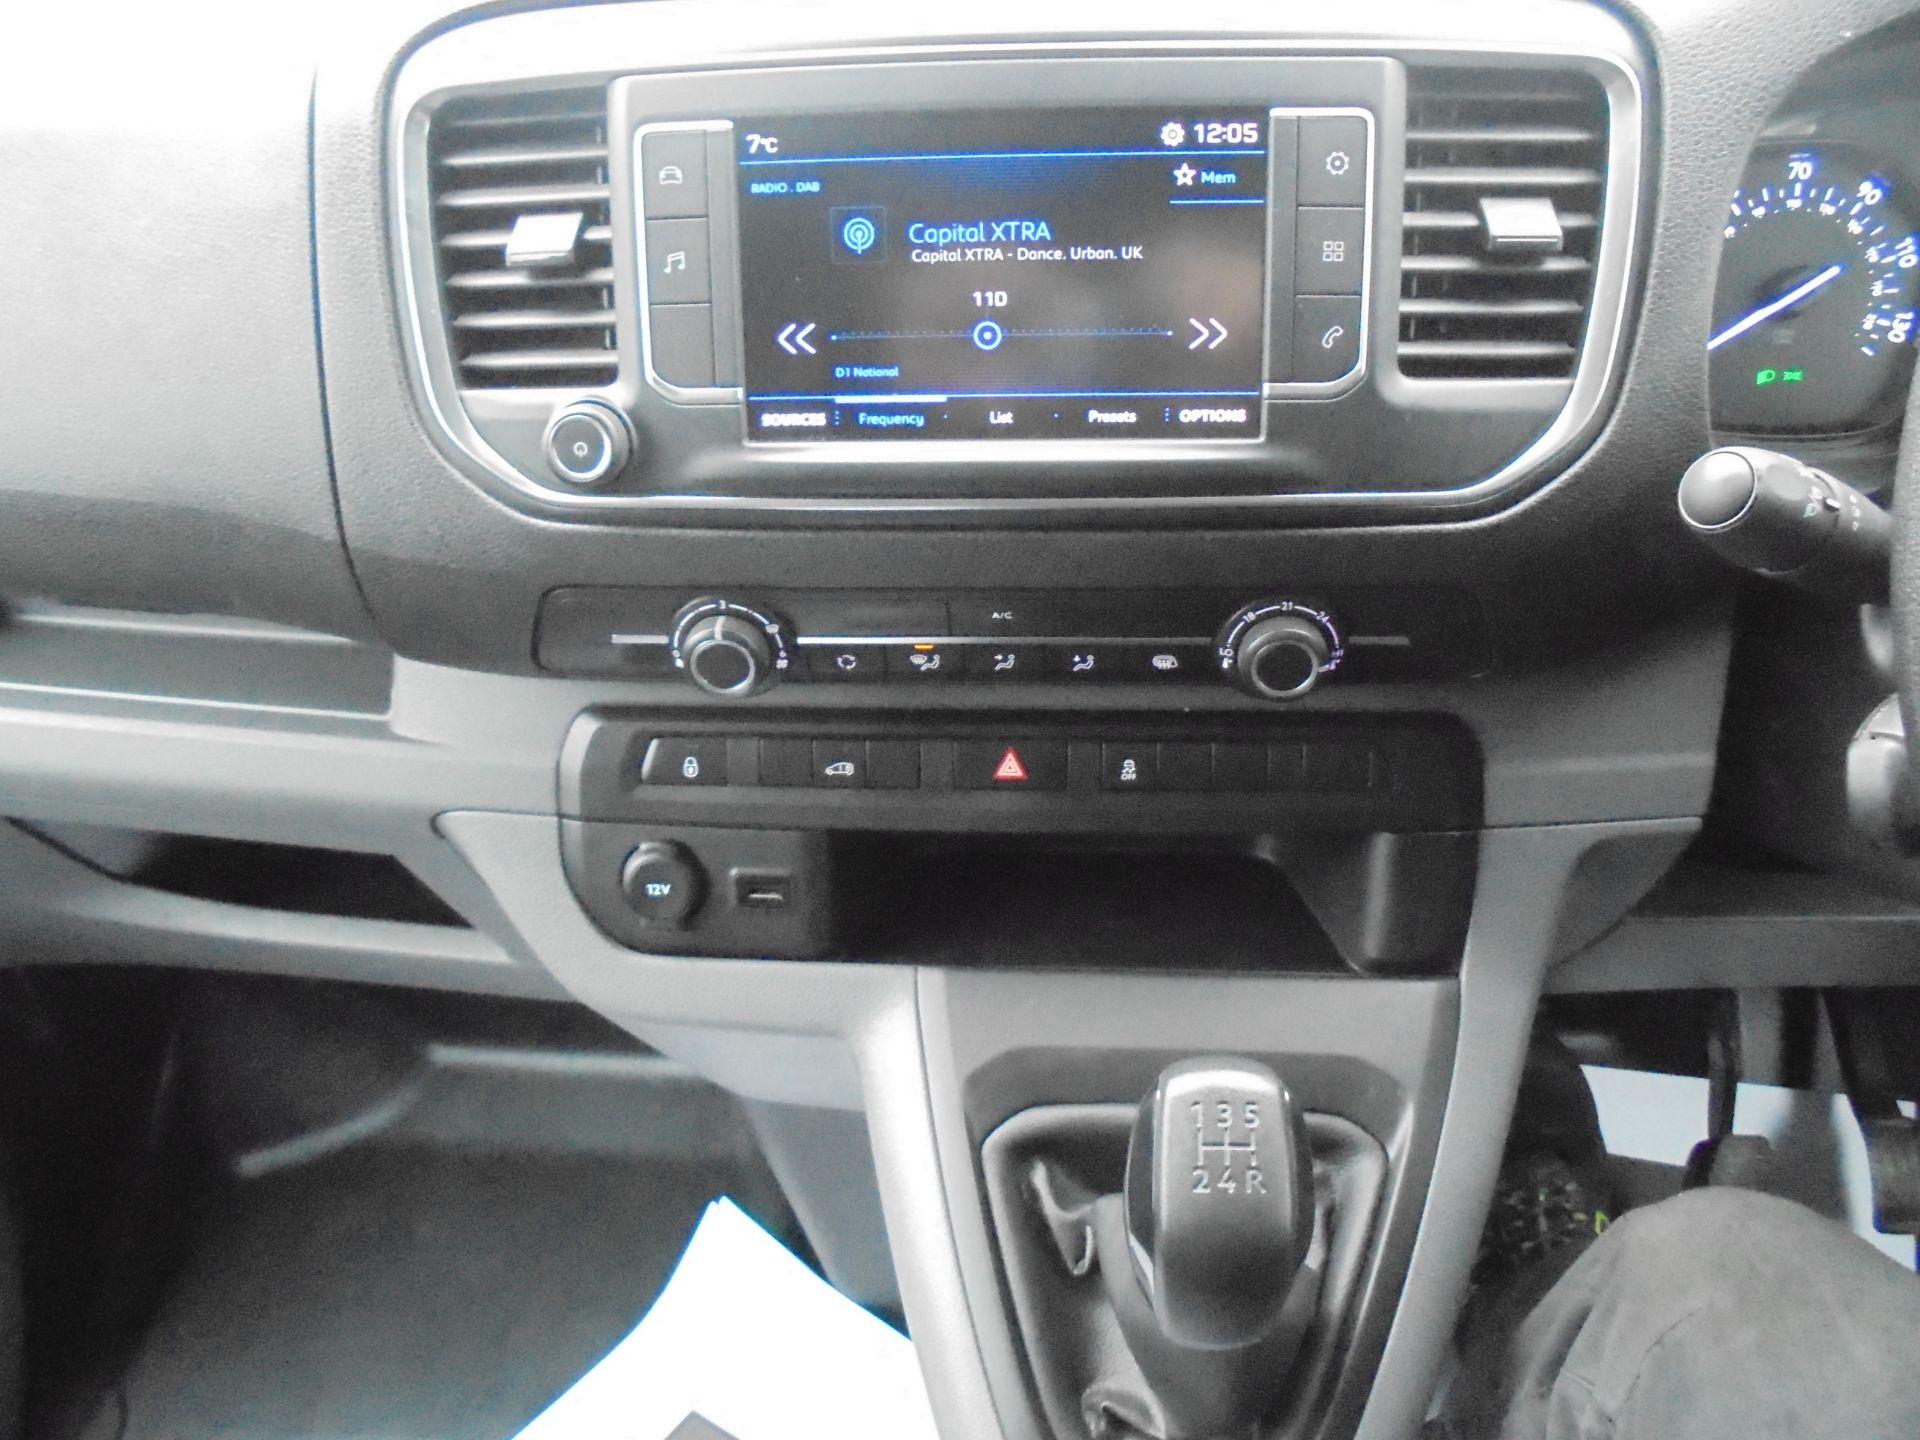 2018 Peugeot Expert STANDARD 1000 1.6 BLUEHDI 95 PROFESSIONAL EURO 6 (NU68HBH) Image 13